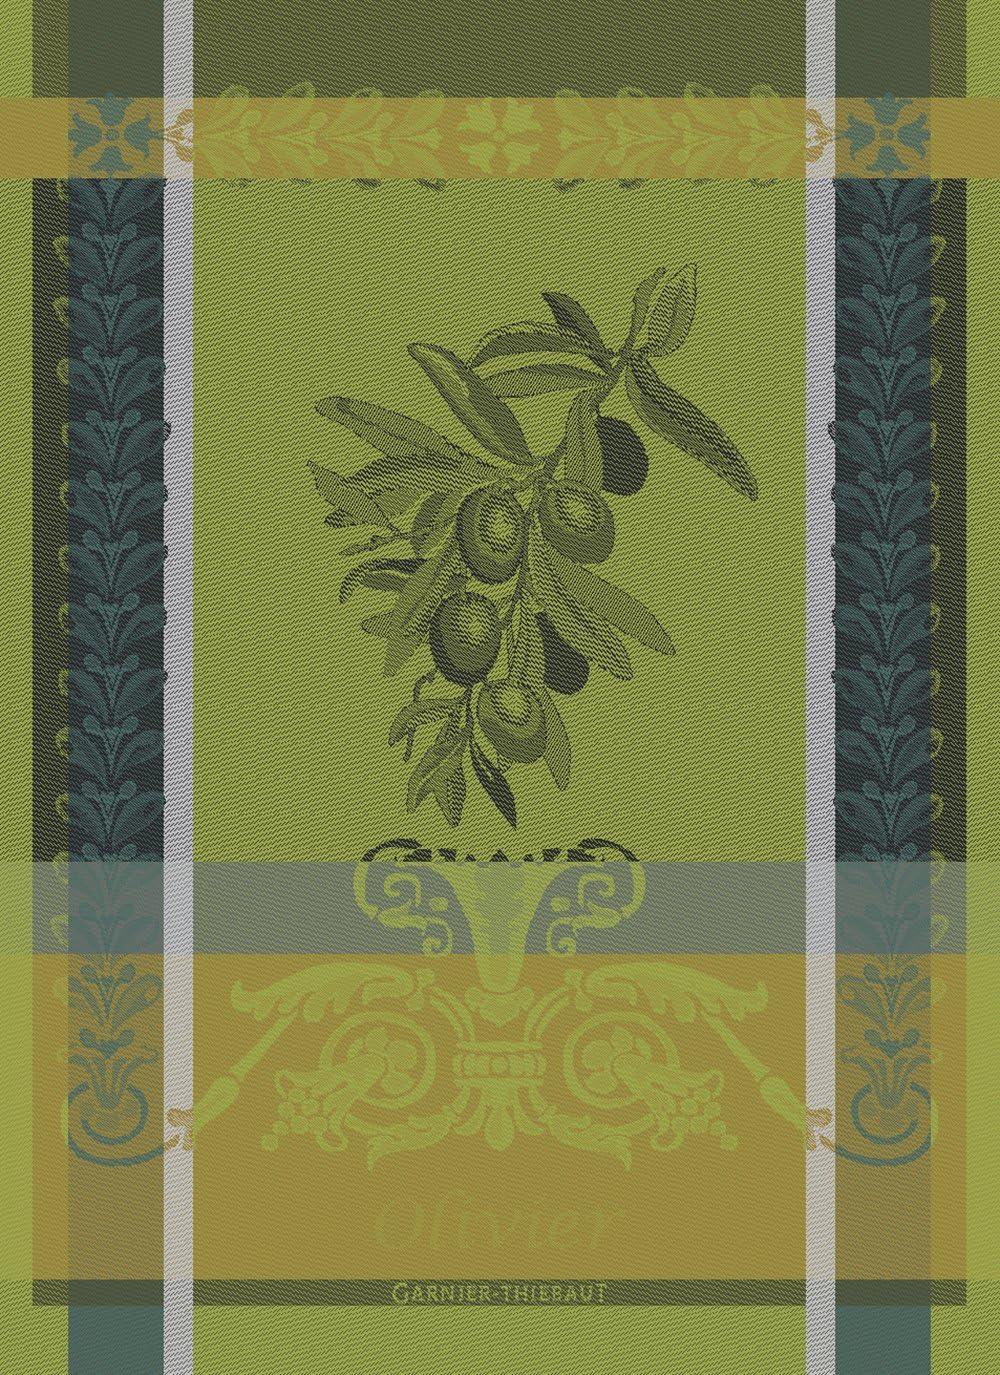 Cotone 56/x 77/cm Garnier Thiebaut canovaccio Verde diesig